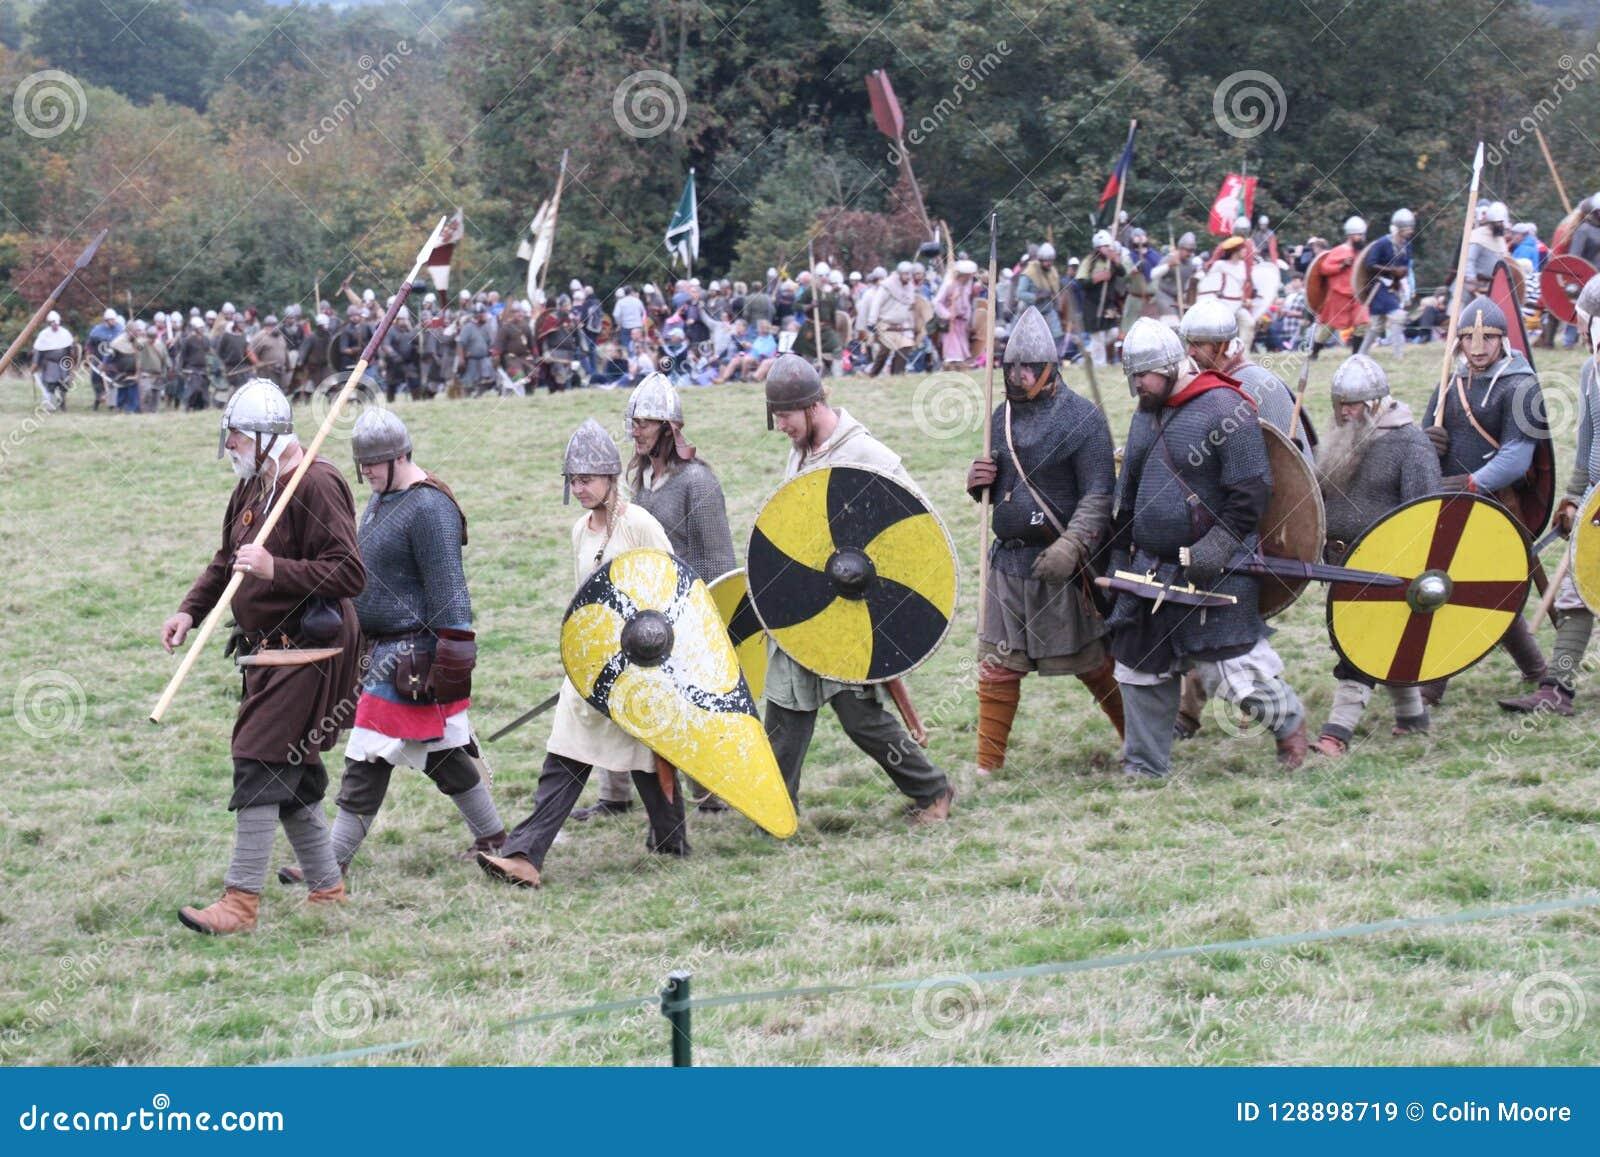 Battle Of Hastings Reenactment Editorial Stock Image - Image